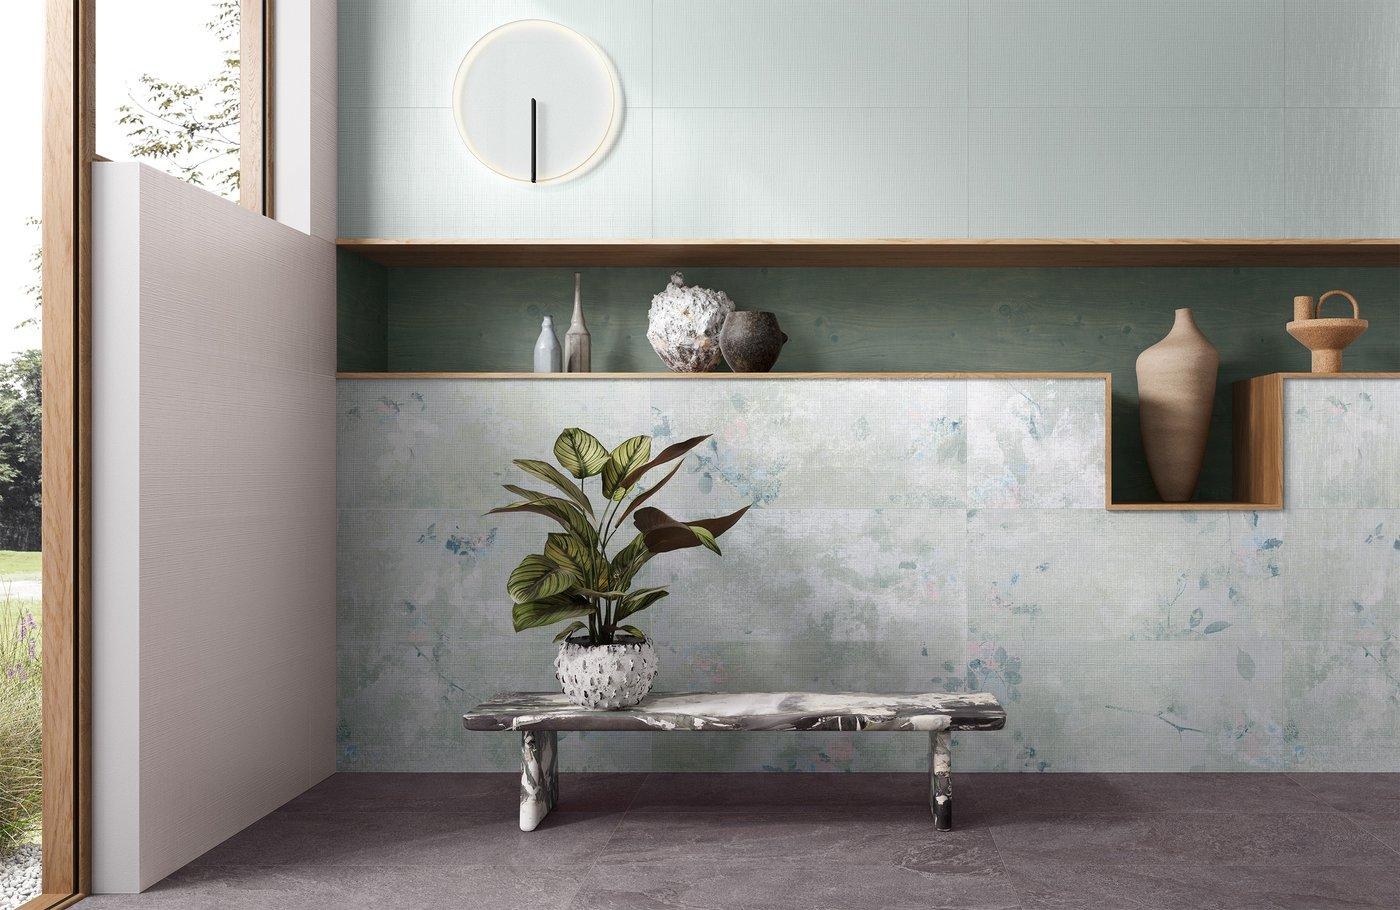 Zelená v kúpeľni - Obrázok č. 21